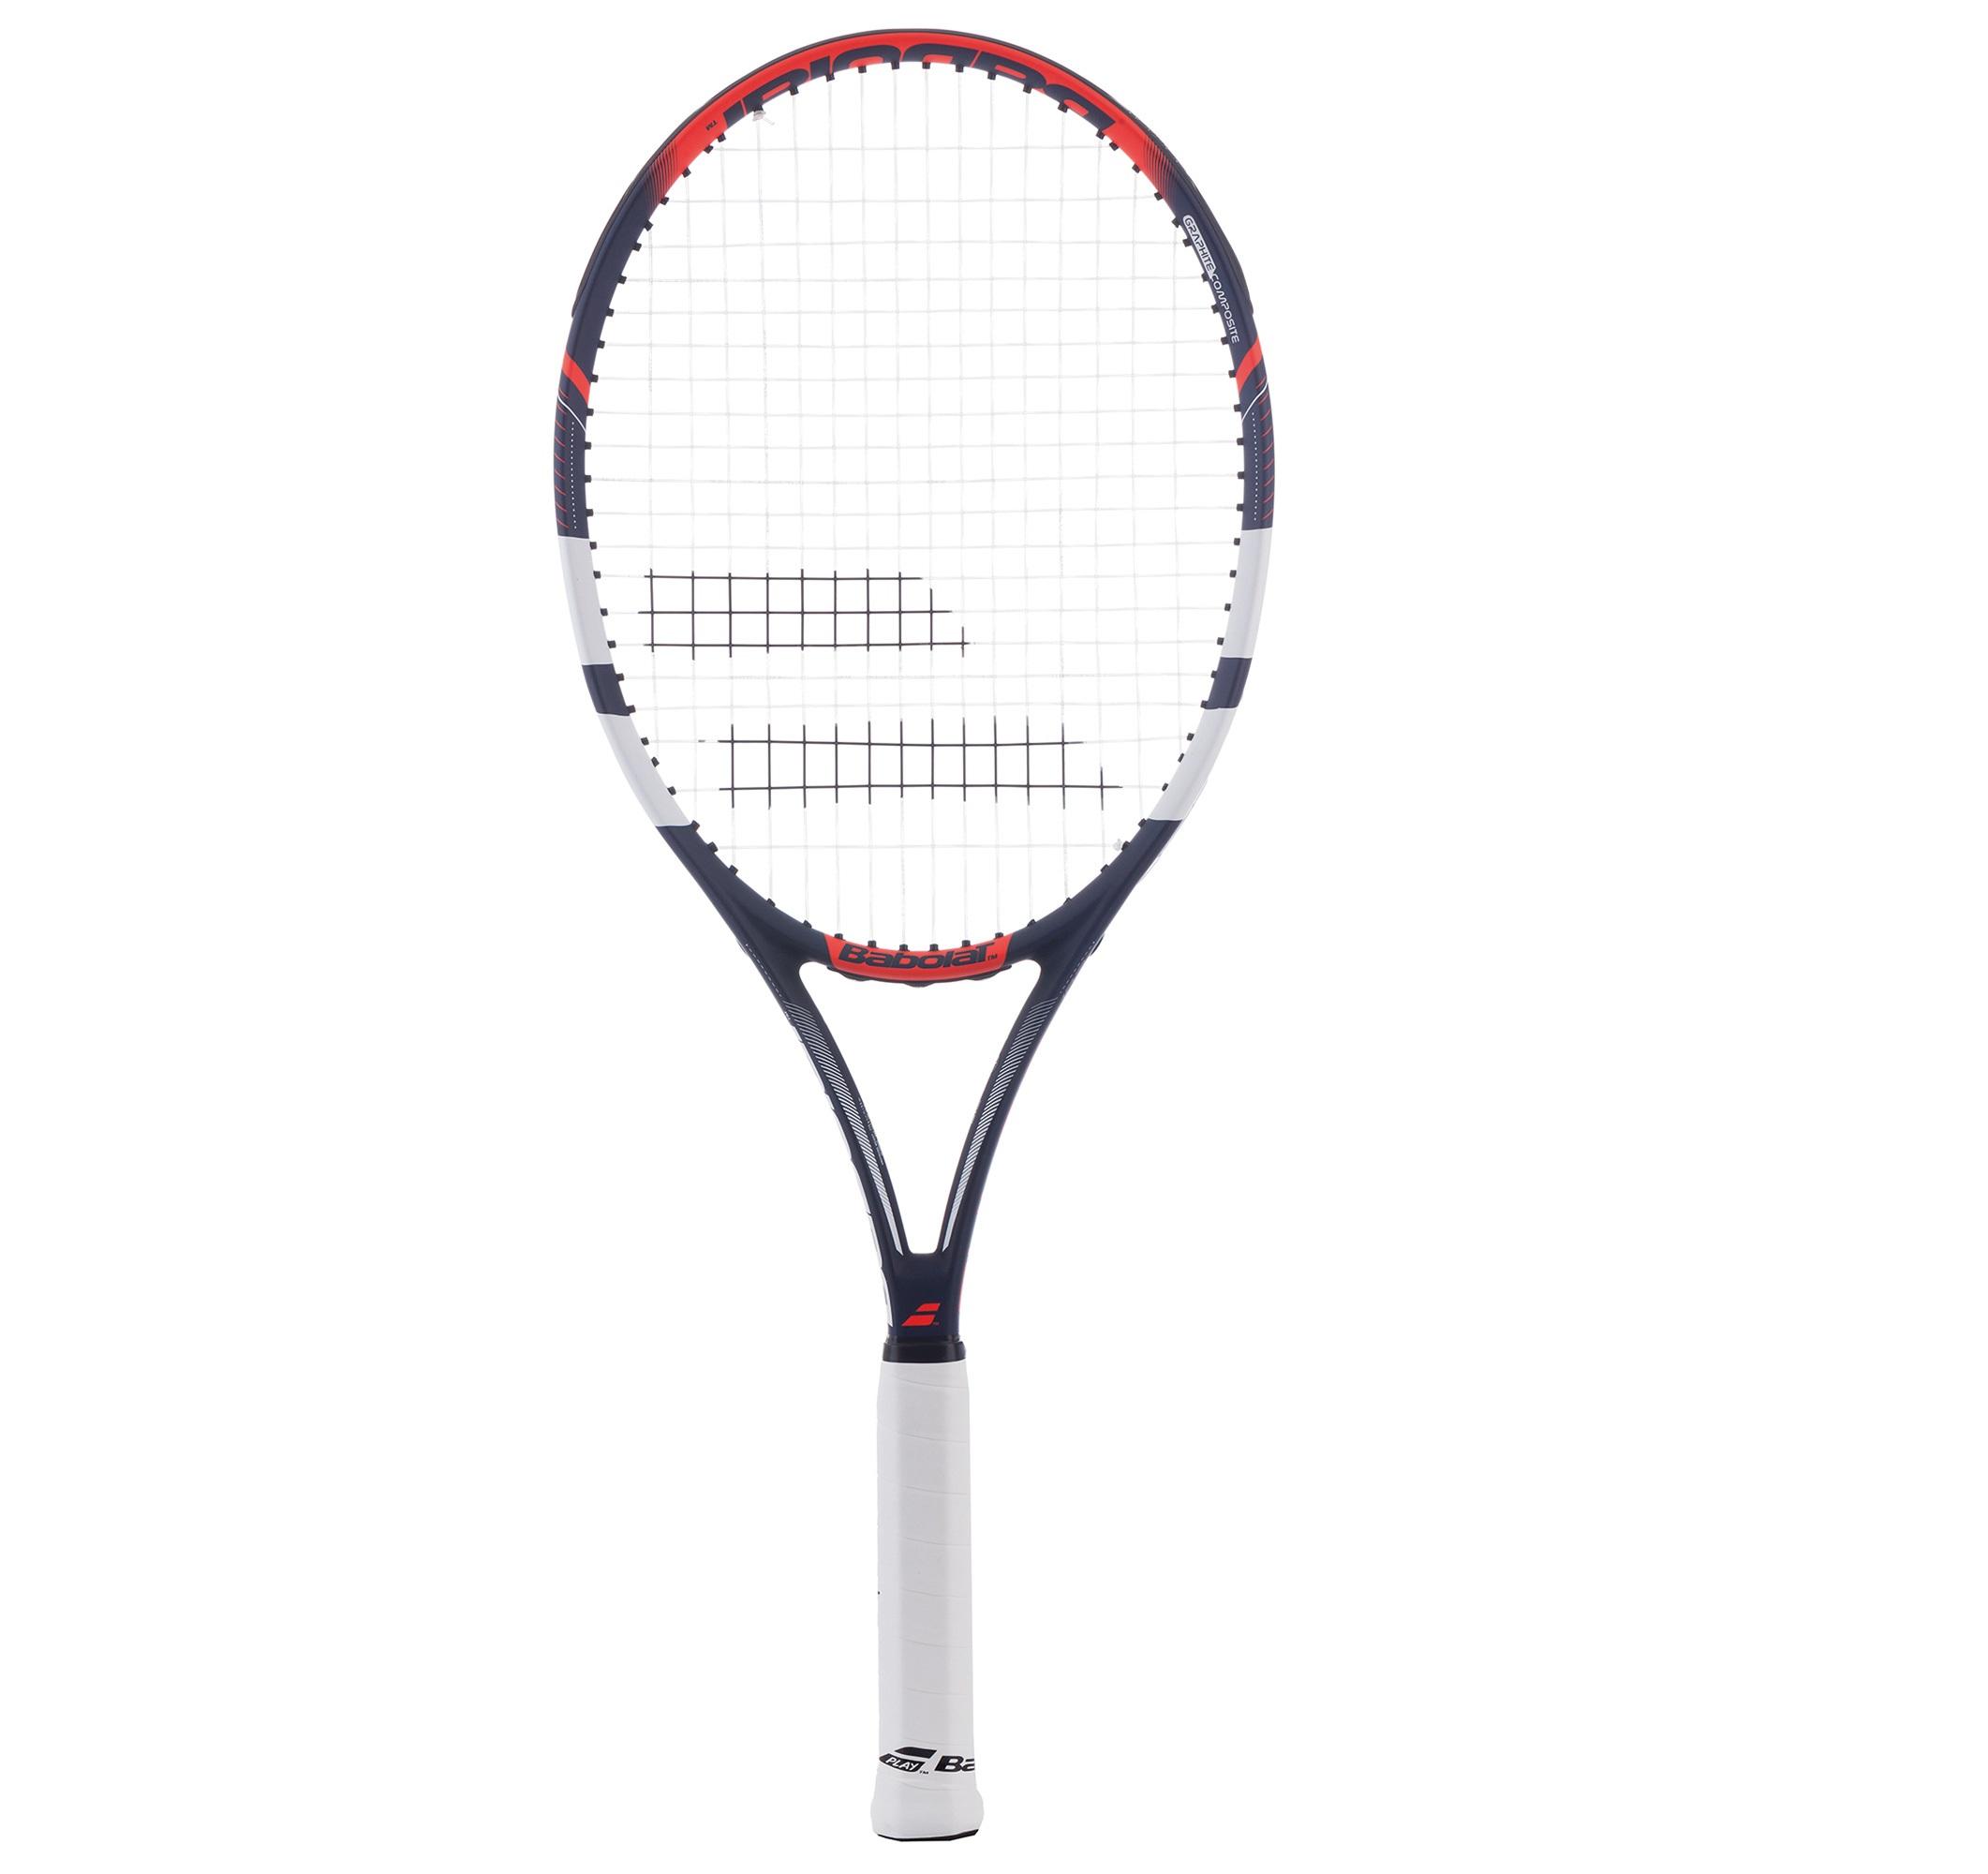 Babolat Ракетка для большого тенниса Babolat Pulsion 102 babolat ракетка для большого тенниса детская babolat ballfighter 23